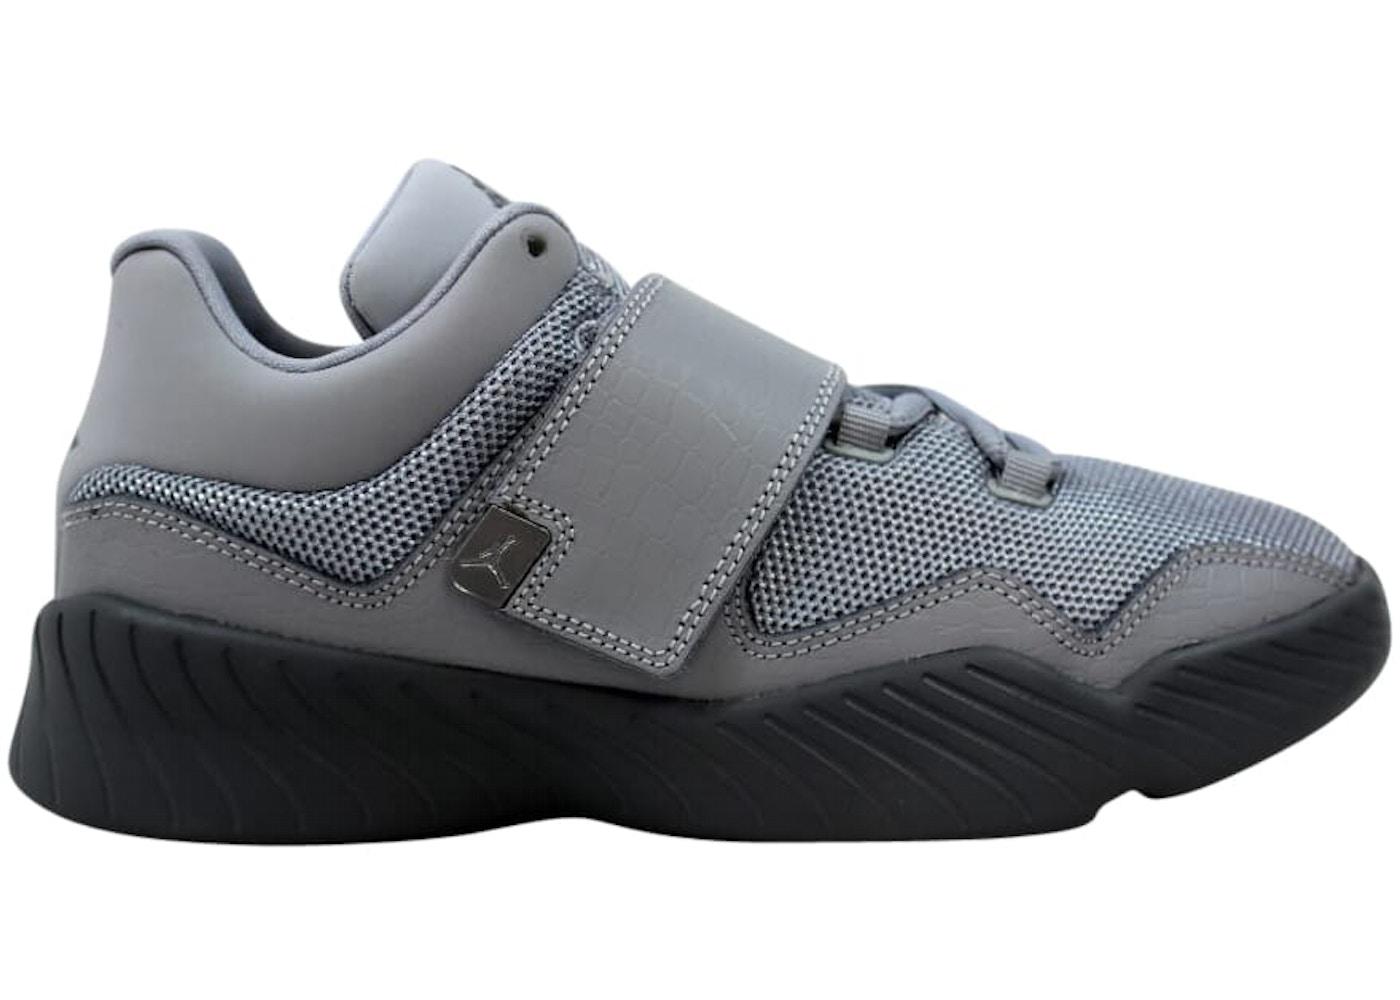 quality design 16378 a9e4b Buy Air Jordan 23 Shoes   Deadstock Sneakers